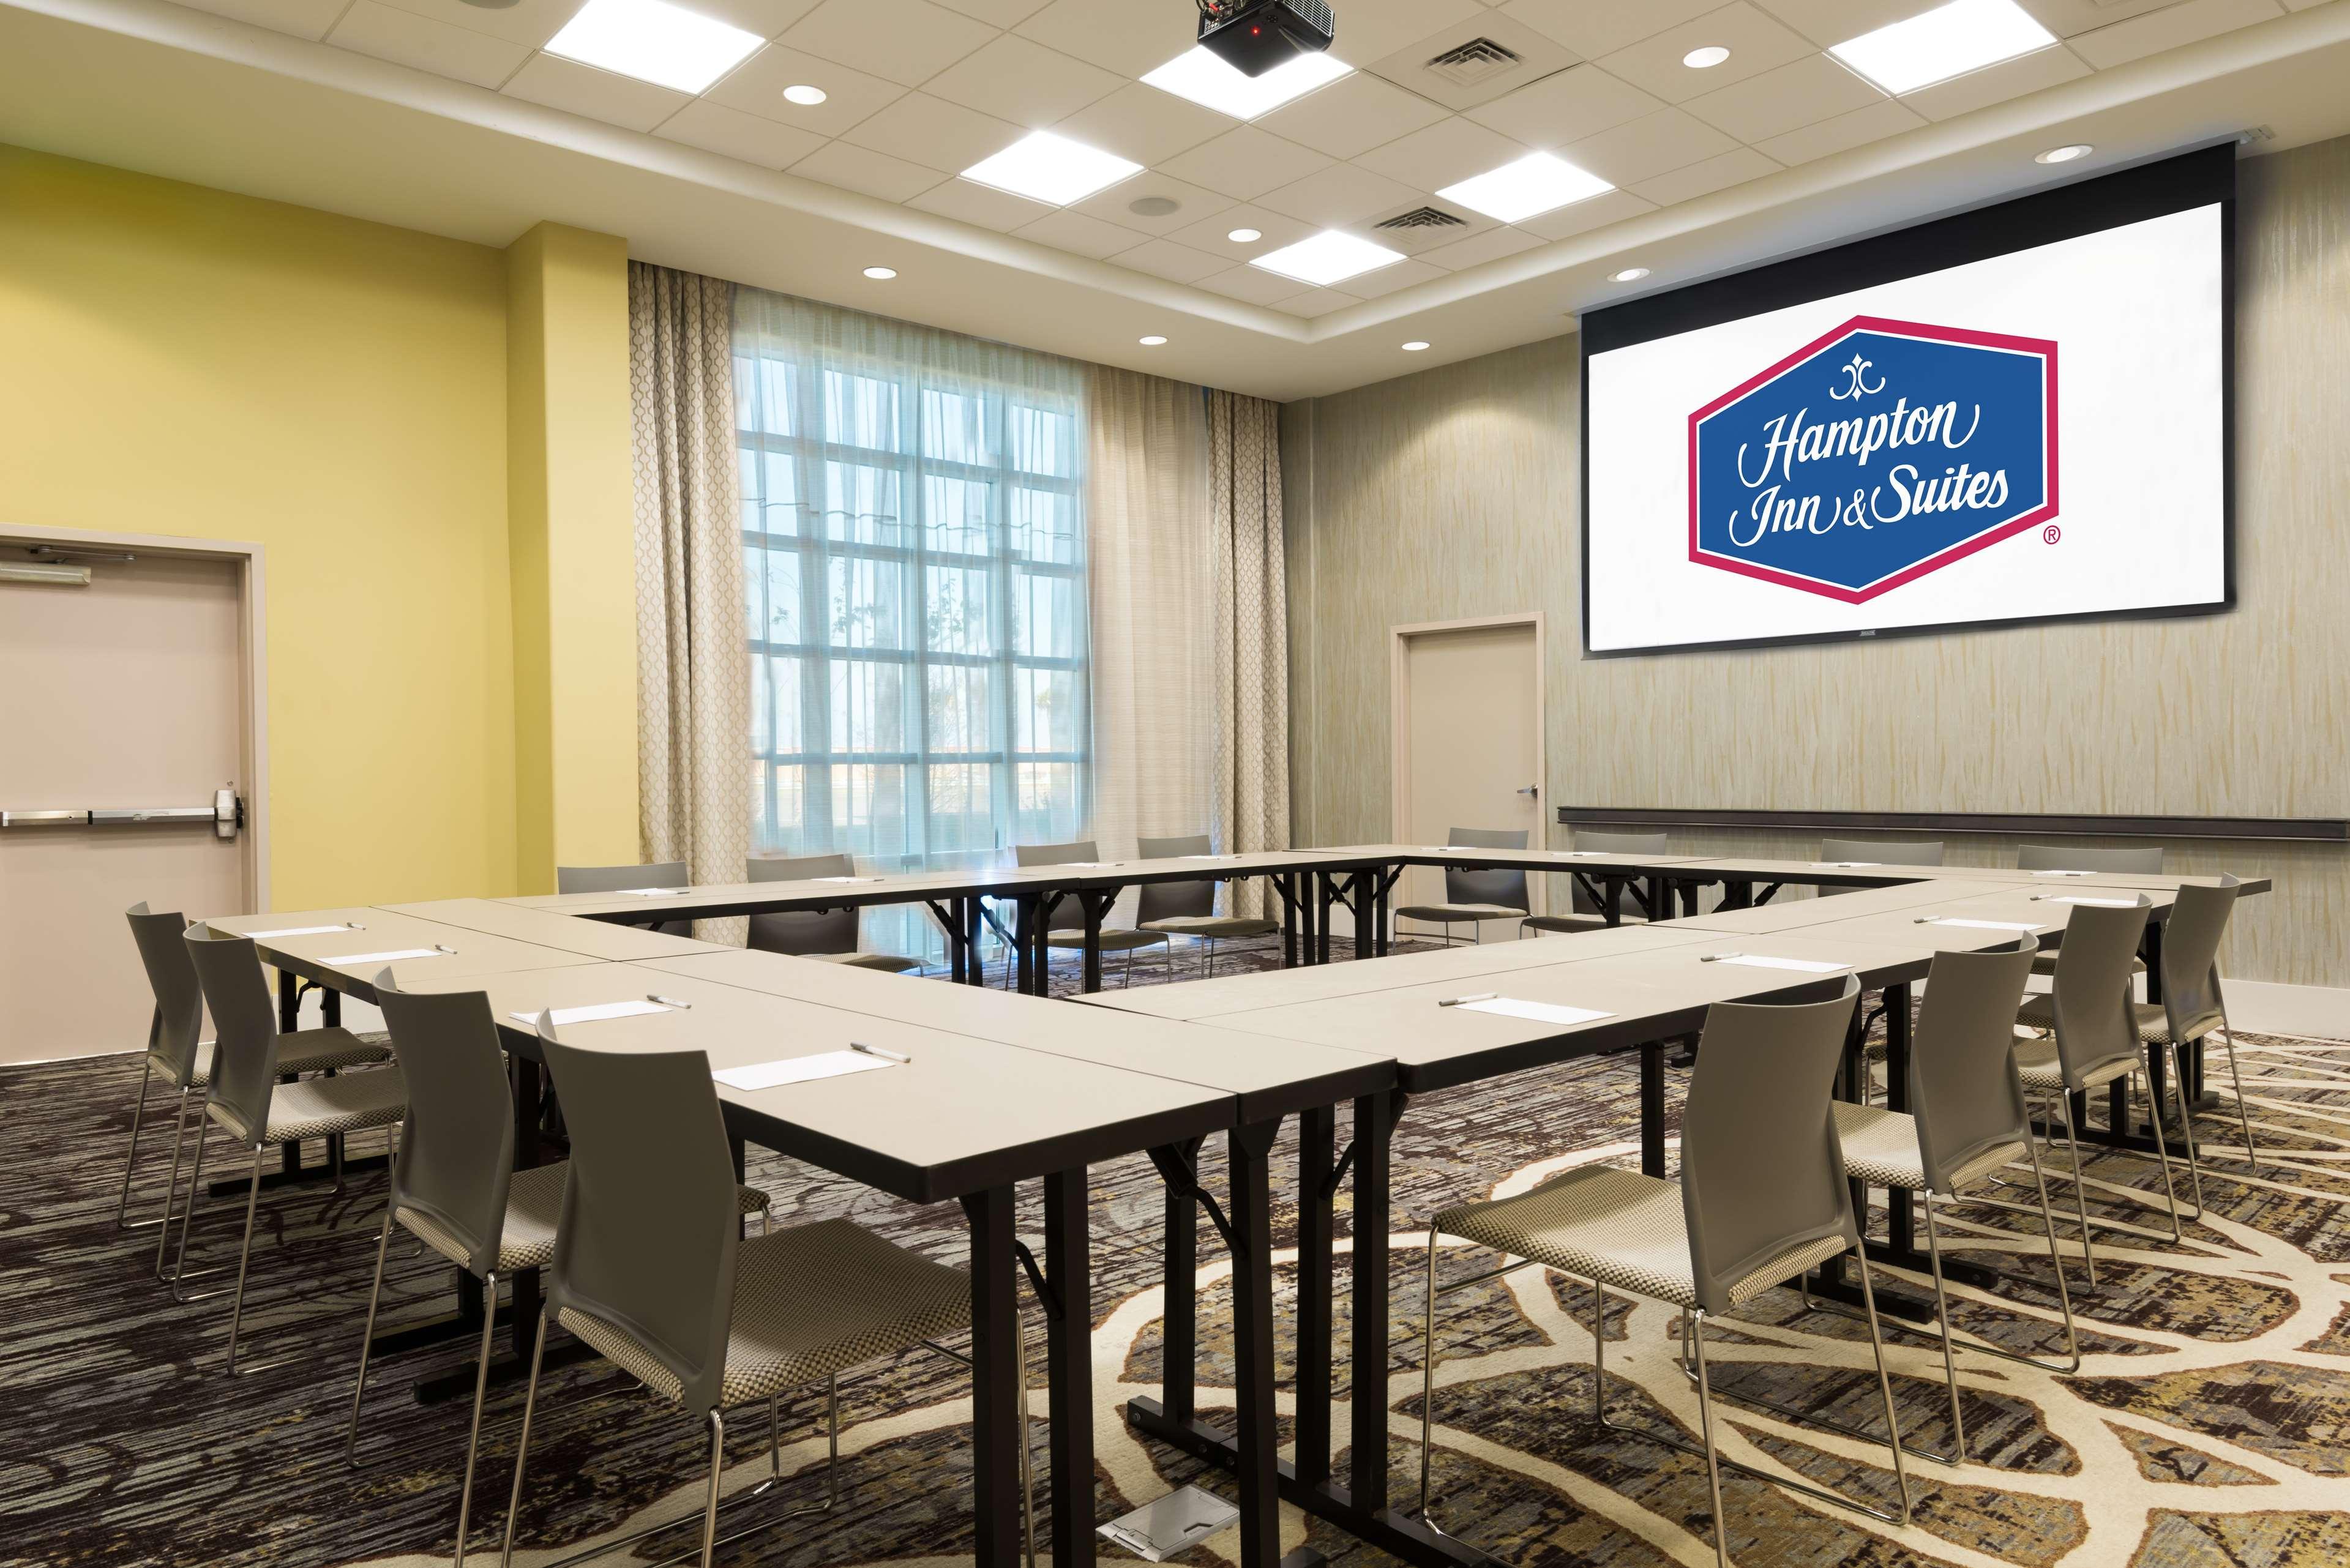 Hampton Inn & Suites Tampa Airport Avion Park Westshore image 28